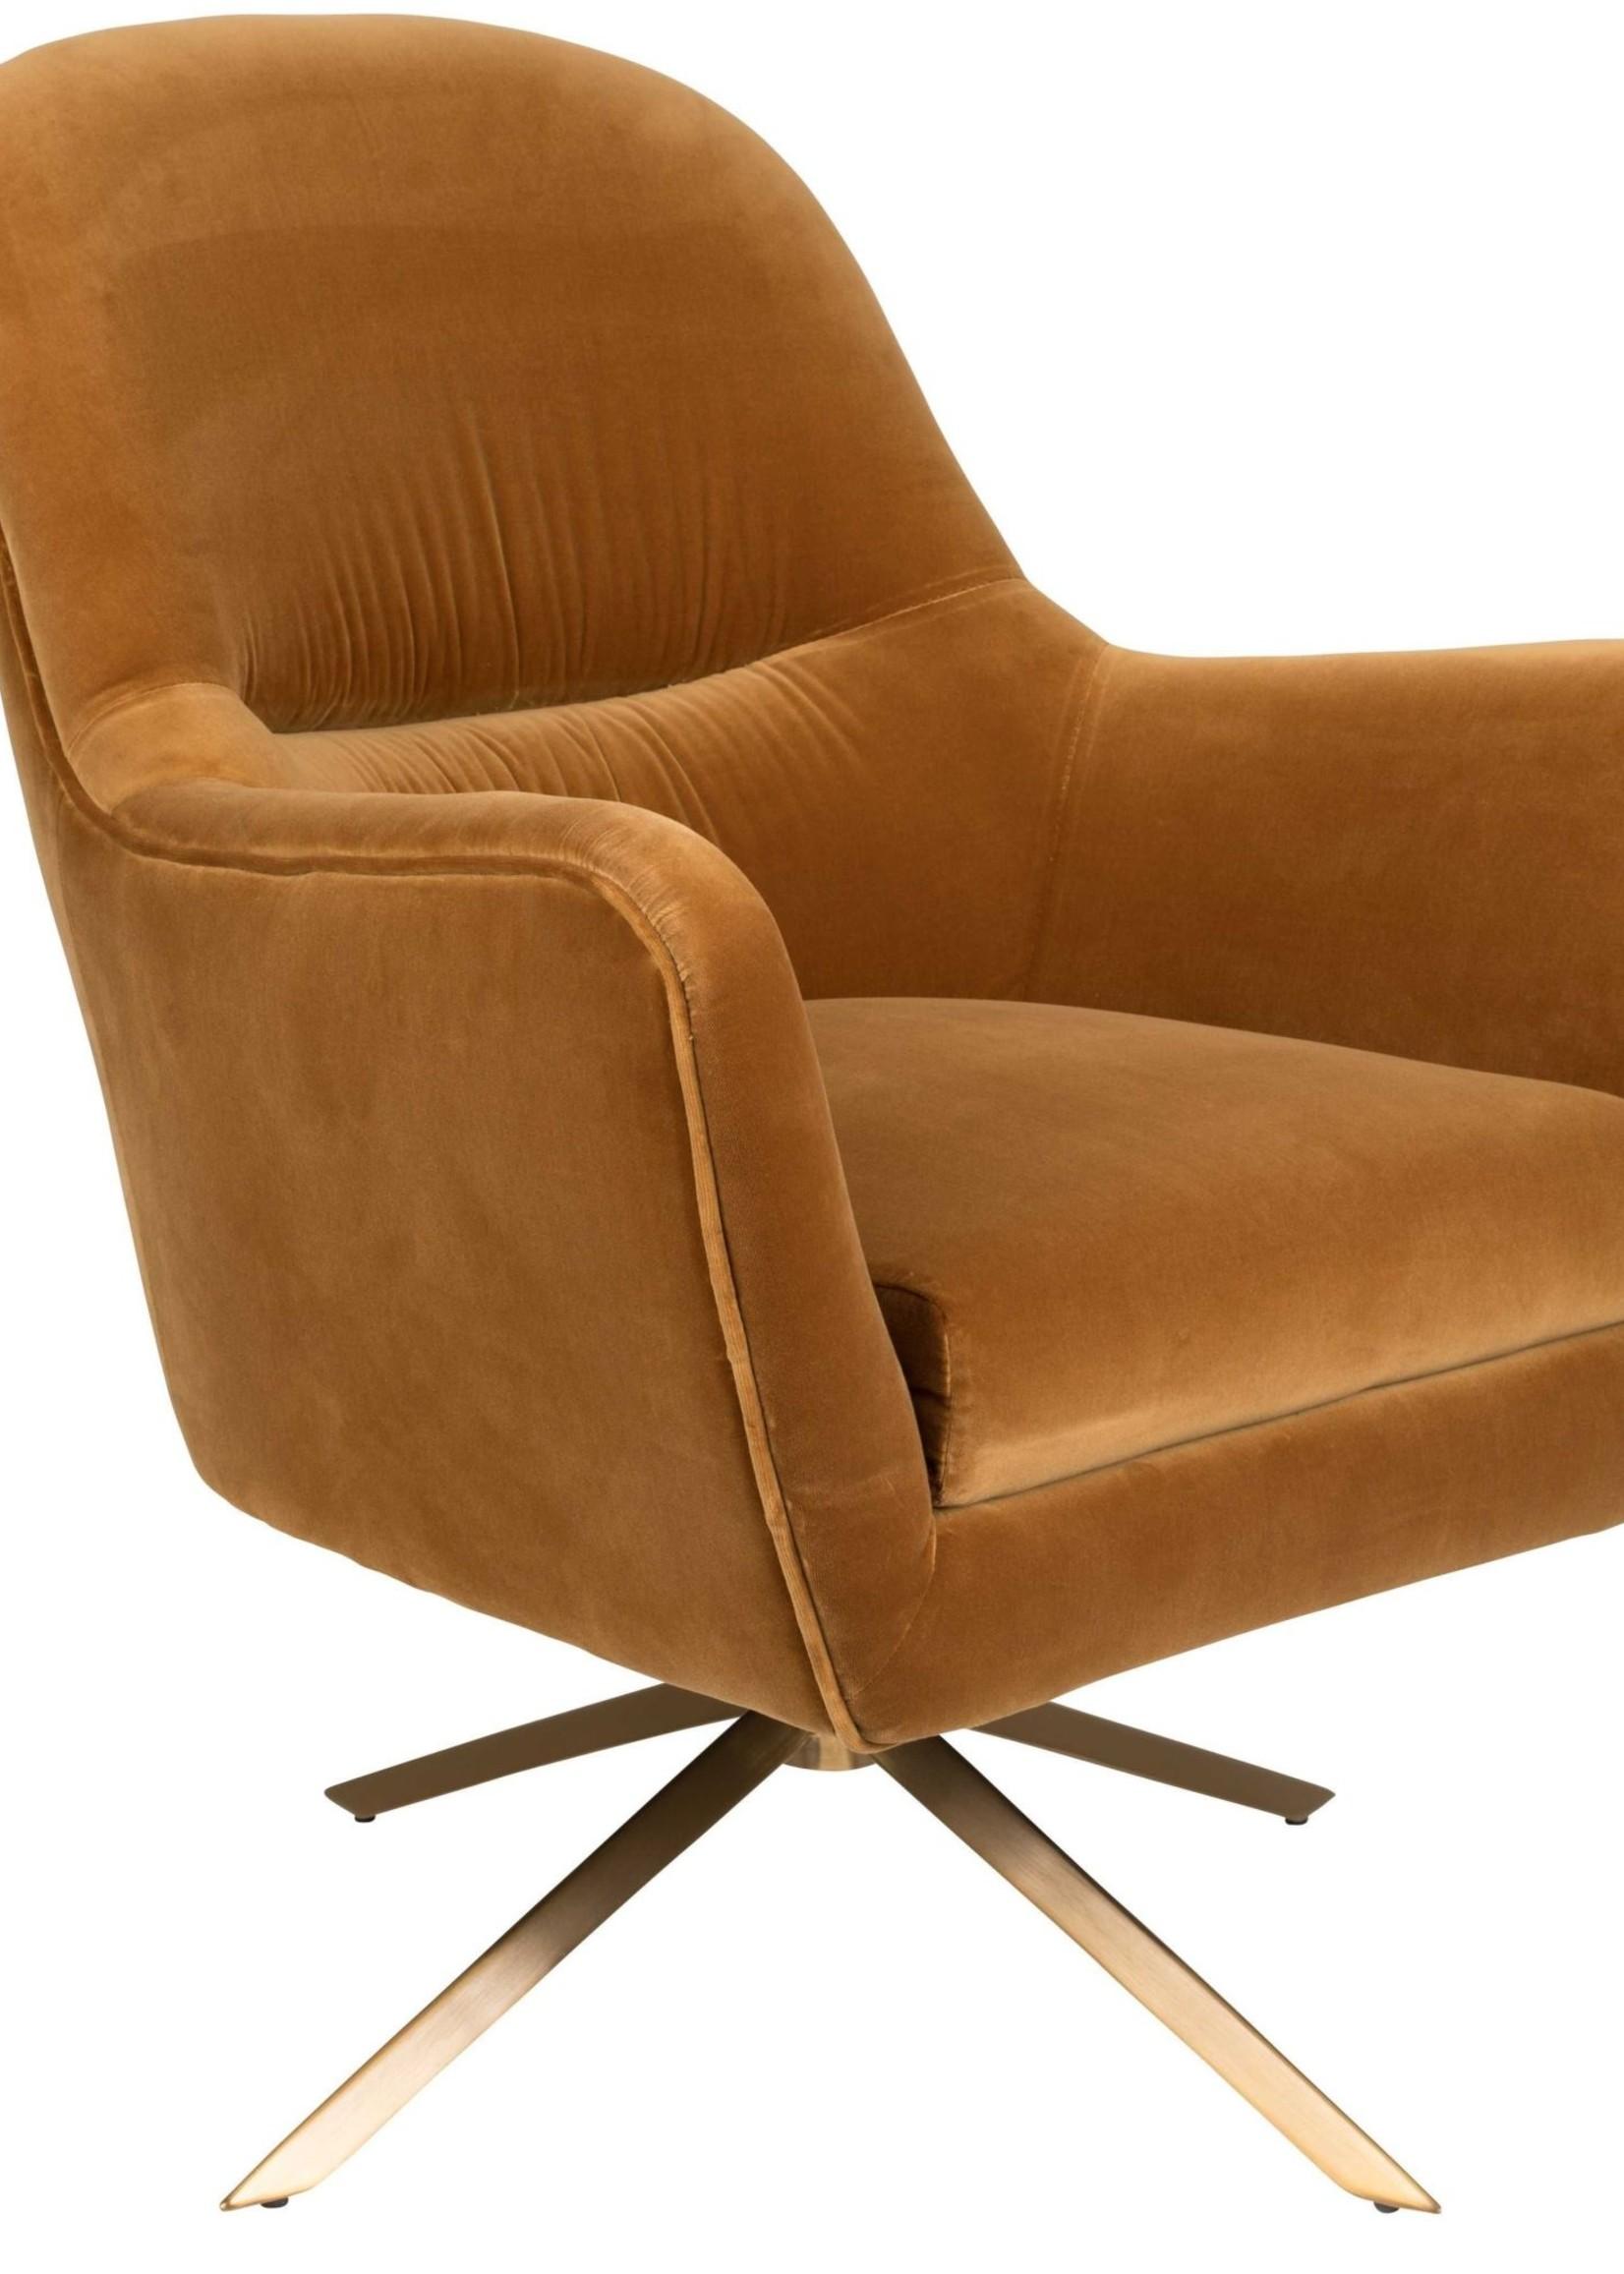 Dutchbone Lounge chair Robusto caramel